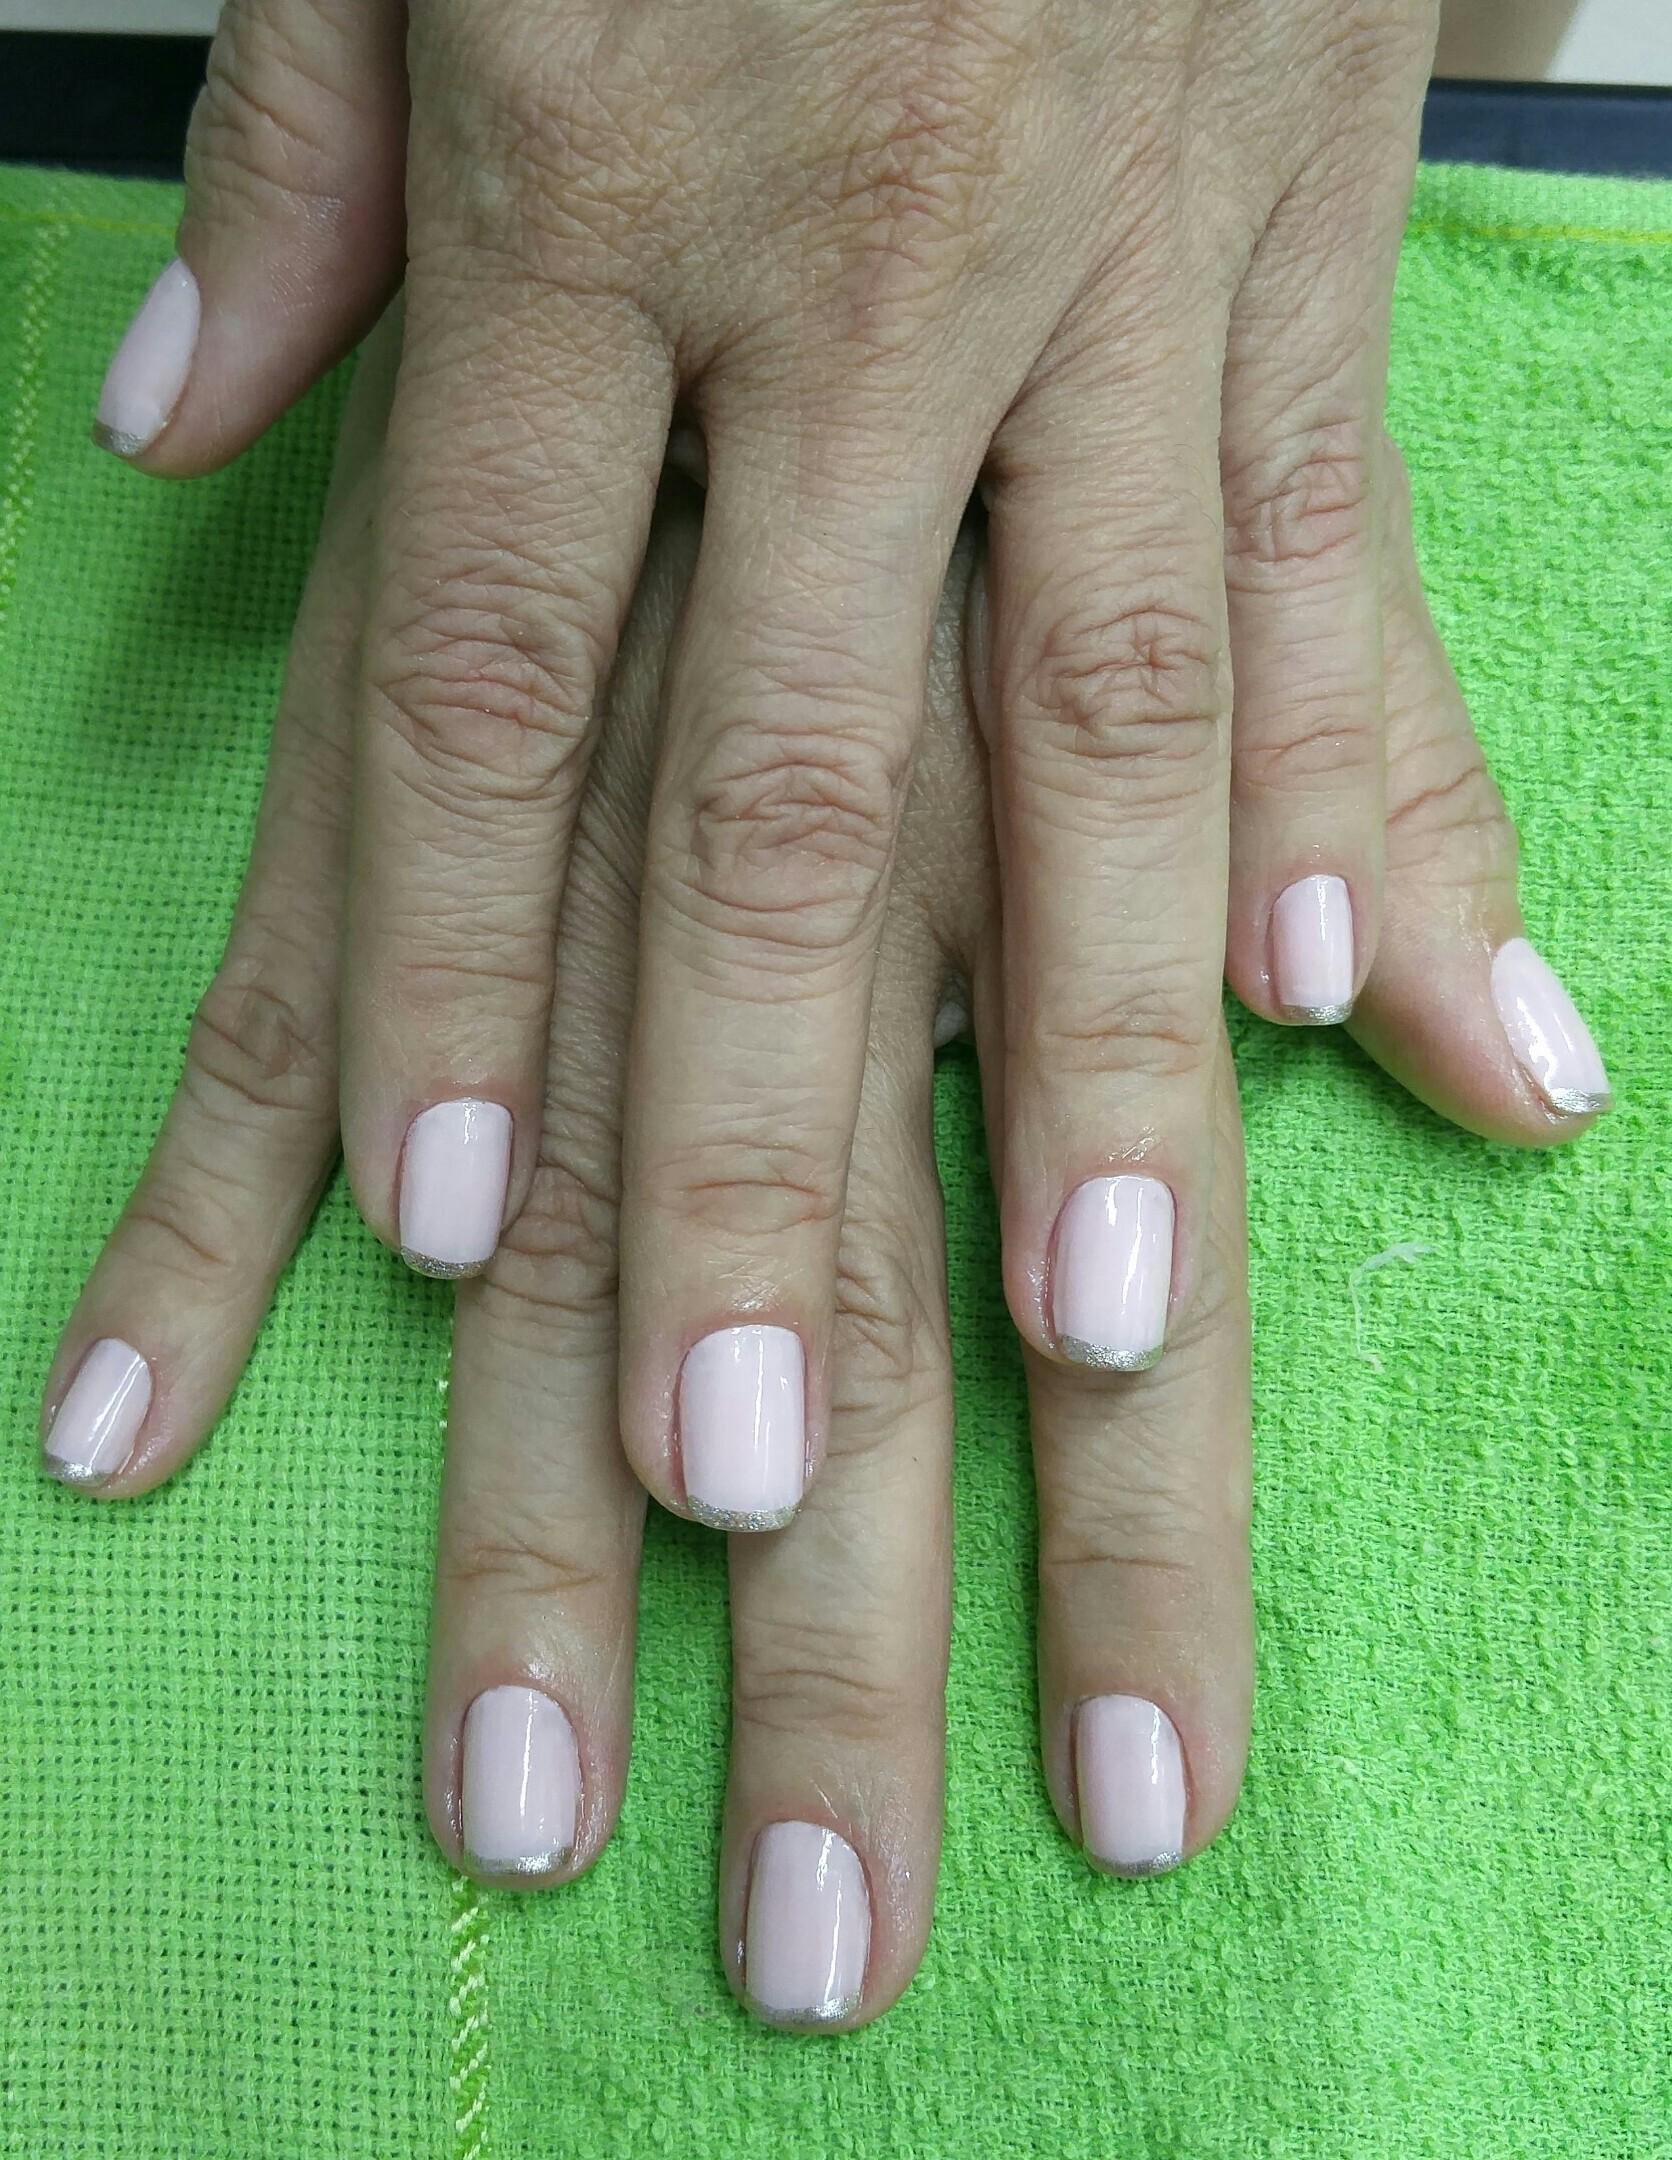 Inglesinha fofa e elegante😍 unha designer de sobrancelhas maquiador(a) manicure e pedicure